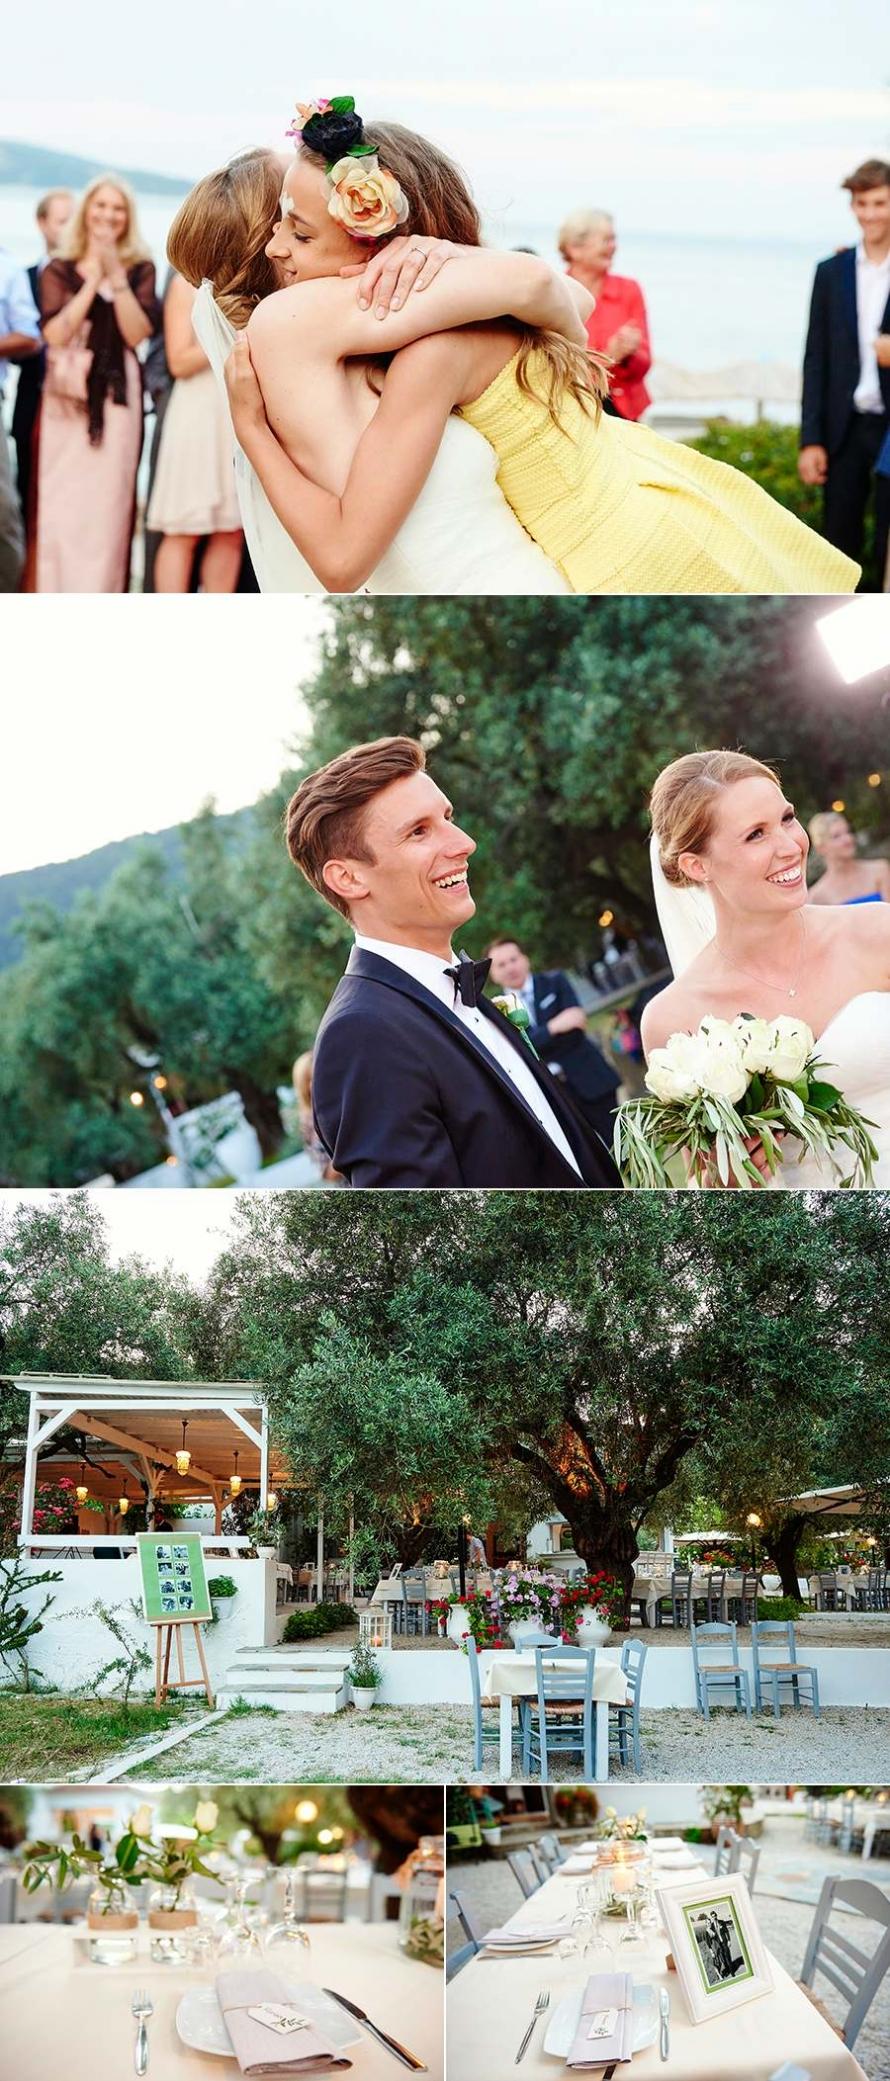 Tobi & Vanessa wedding photos 24